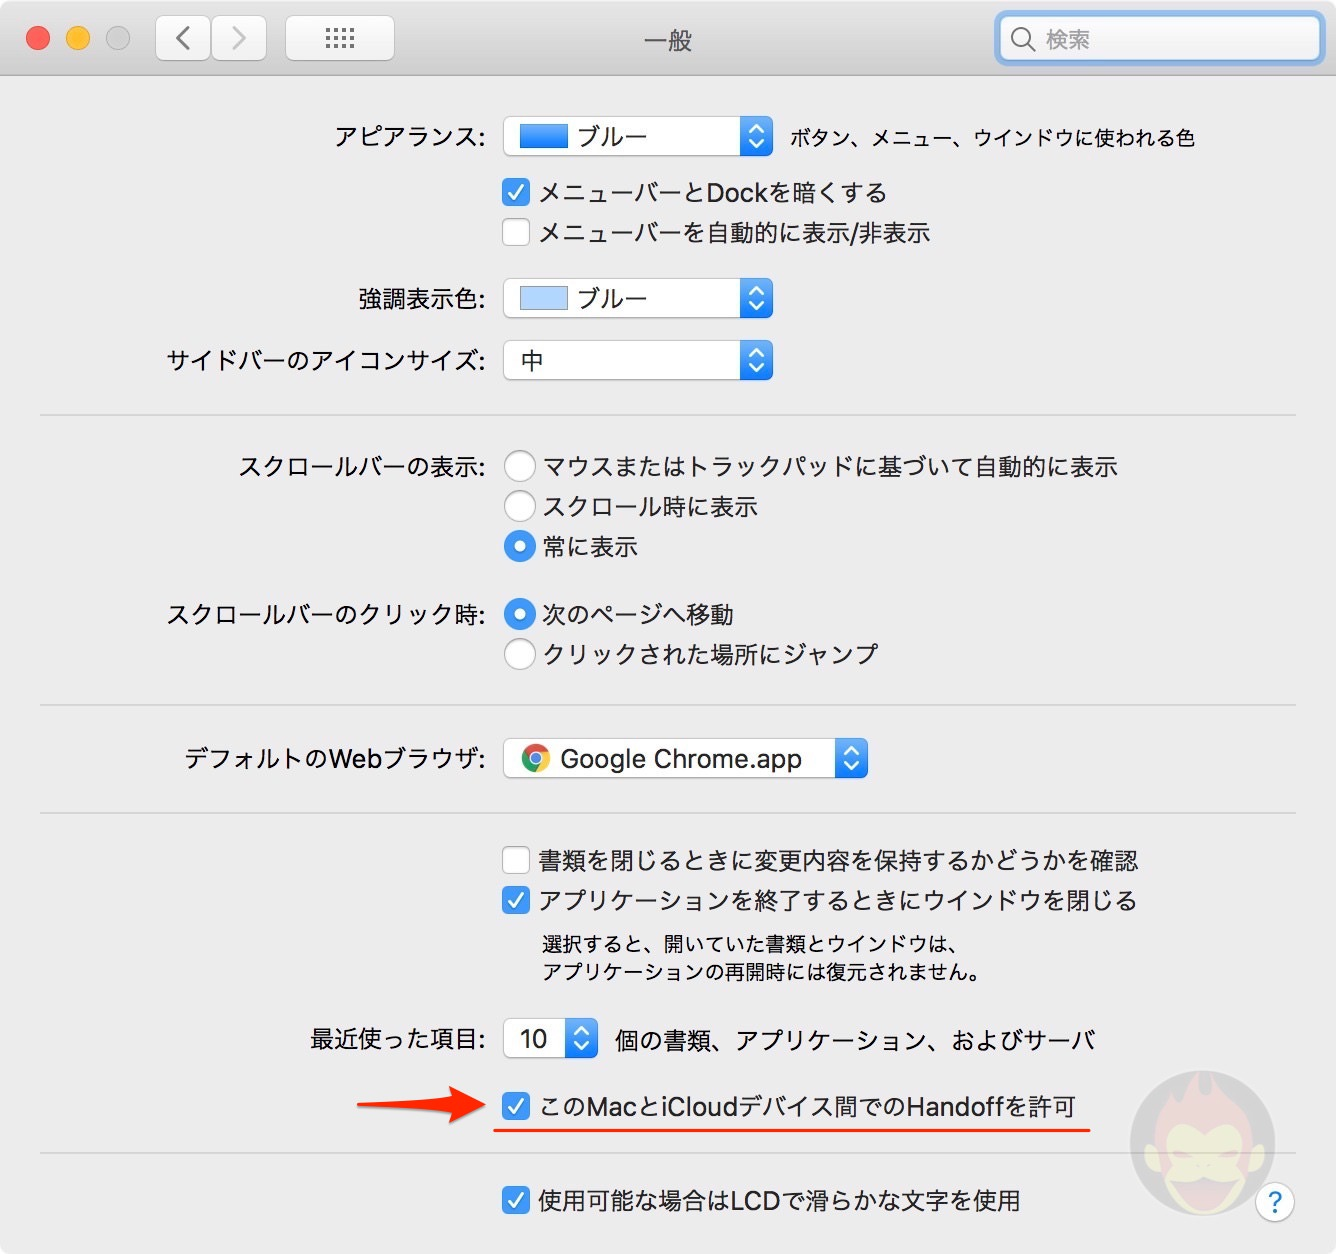 iCloud-Device-HandOff-01-2.jpg